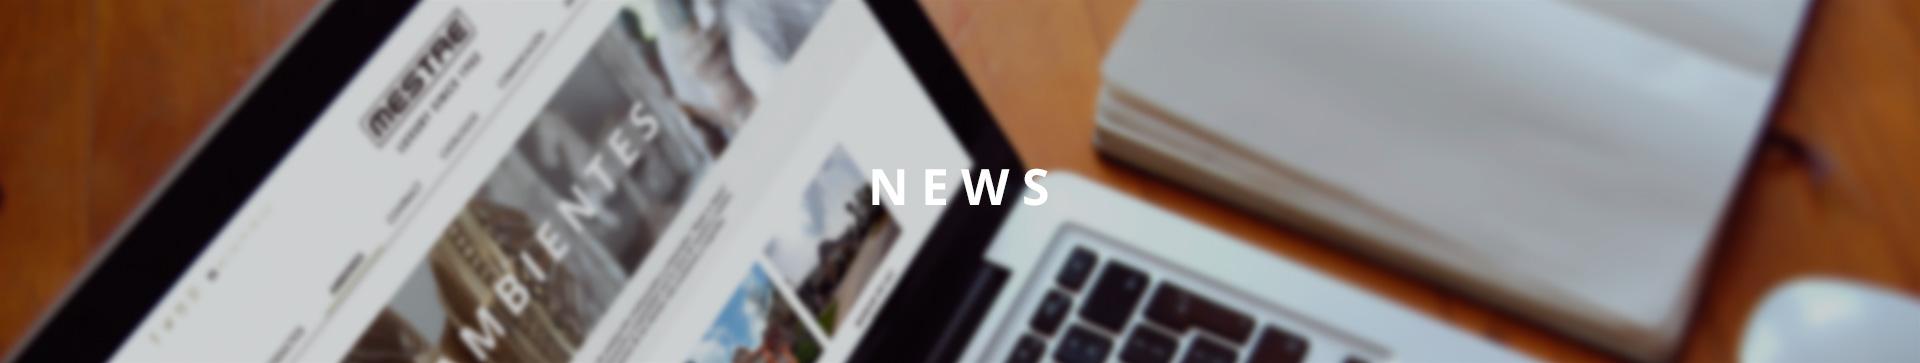 news-2